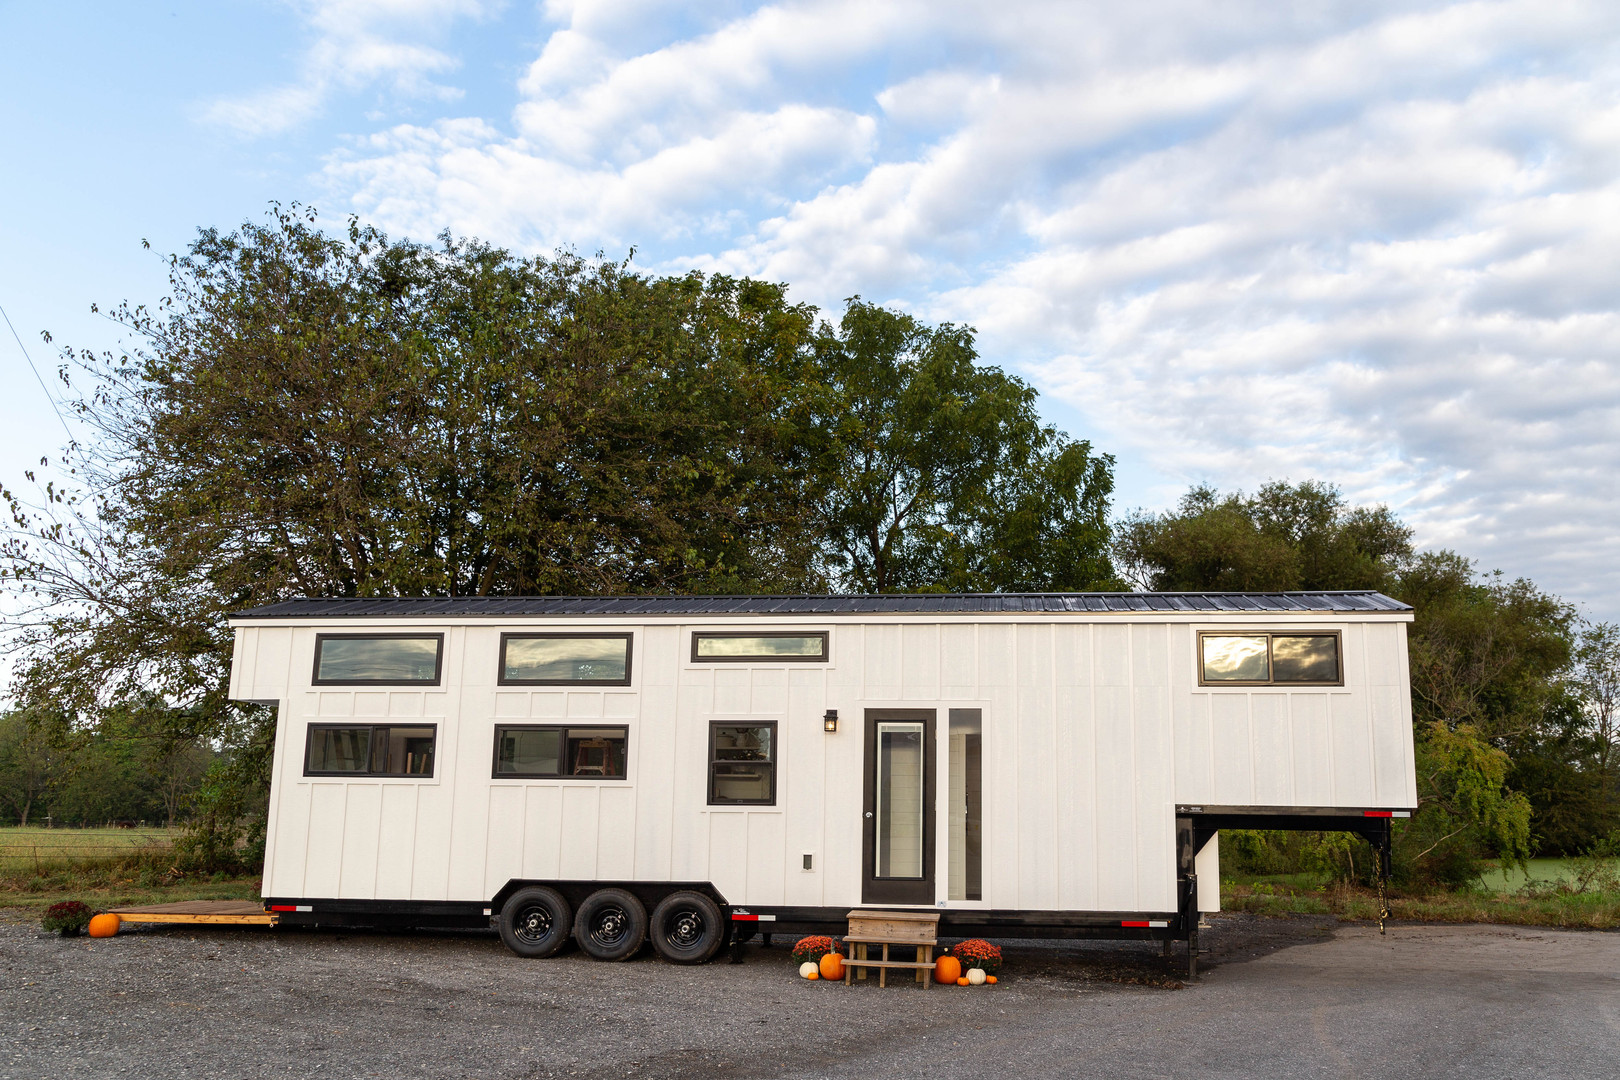 Gooseneck Tiny Home on Wheels